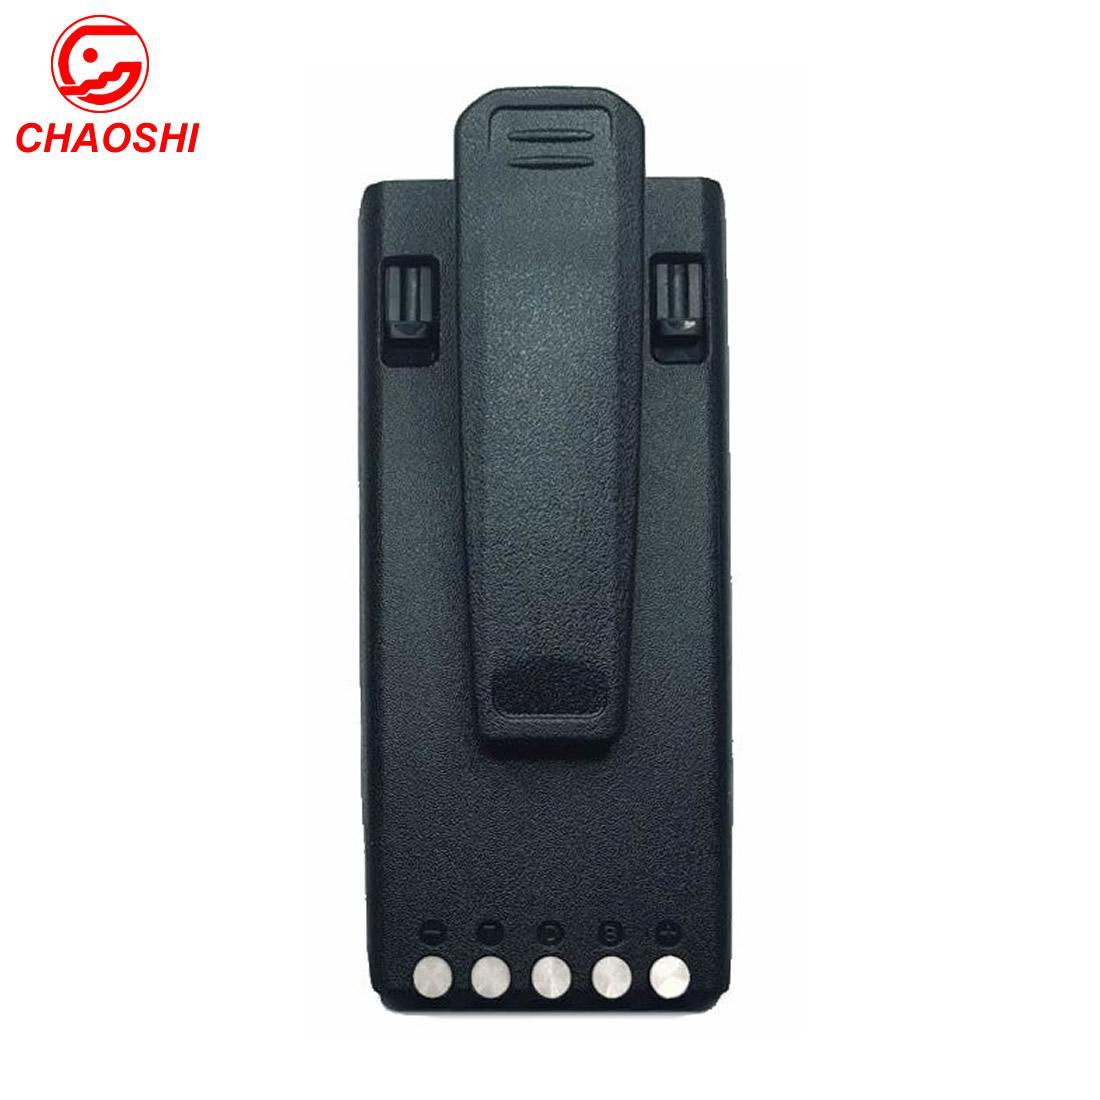 BP284對講機電池 IC-F3400D, IC-F4400D, IC-F70 6